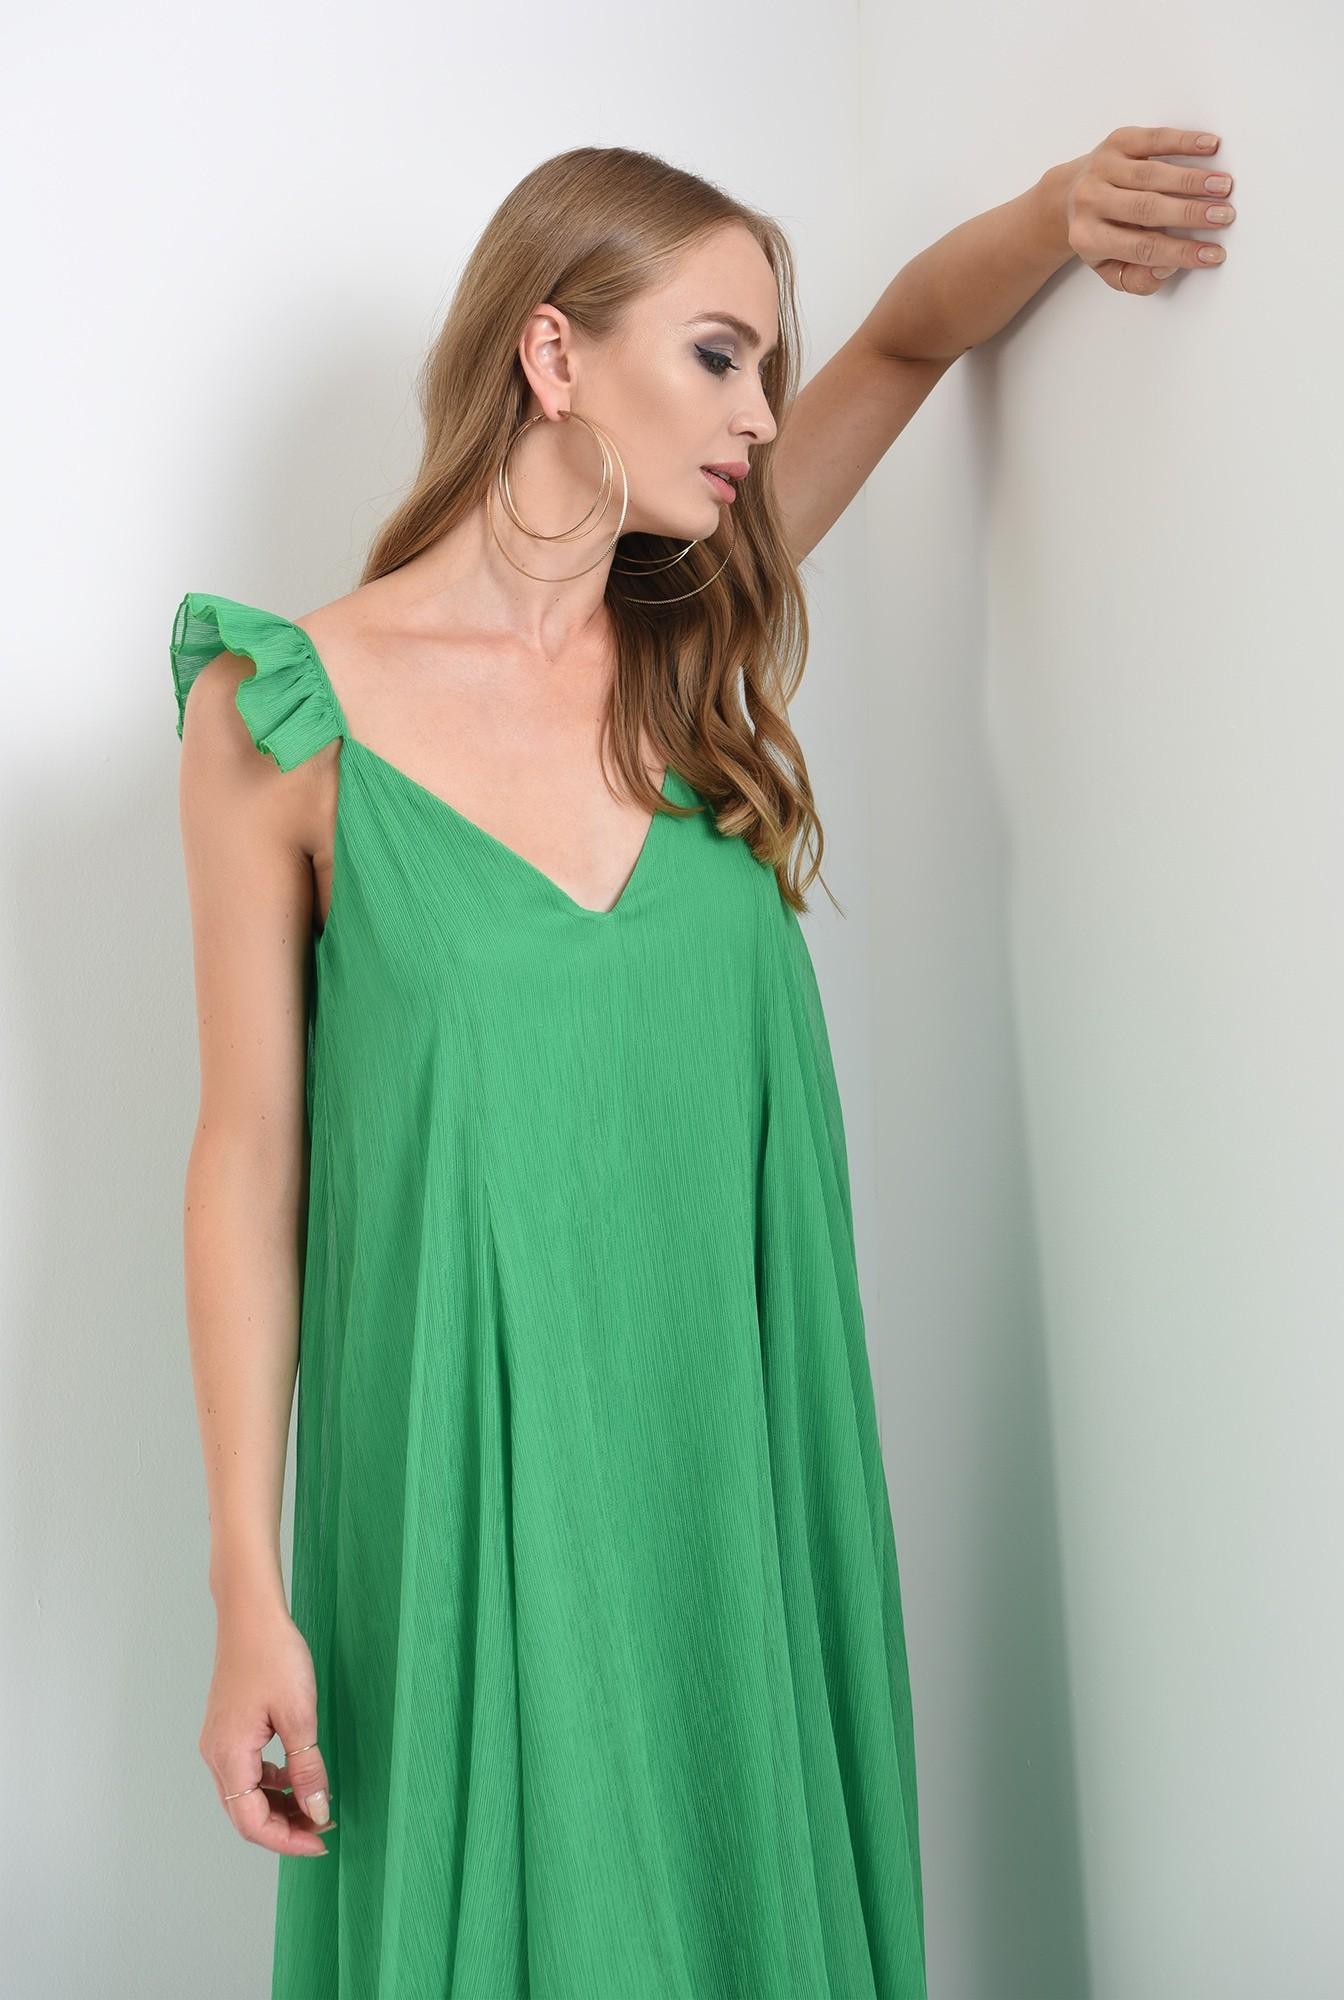 2 - rochie lunga, cu anchior, bretele volan, evazata, verde, Poema